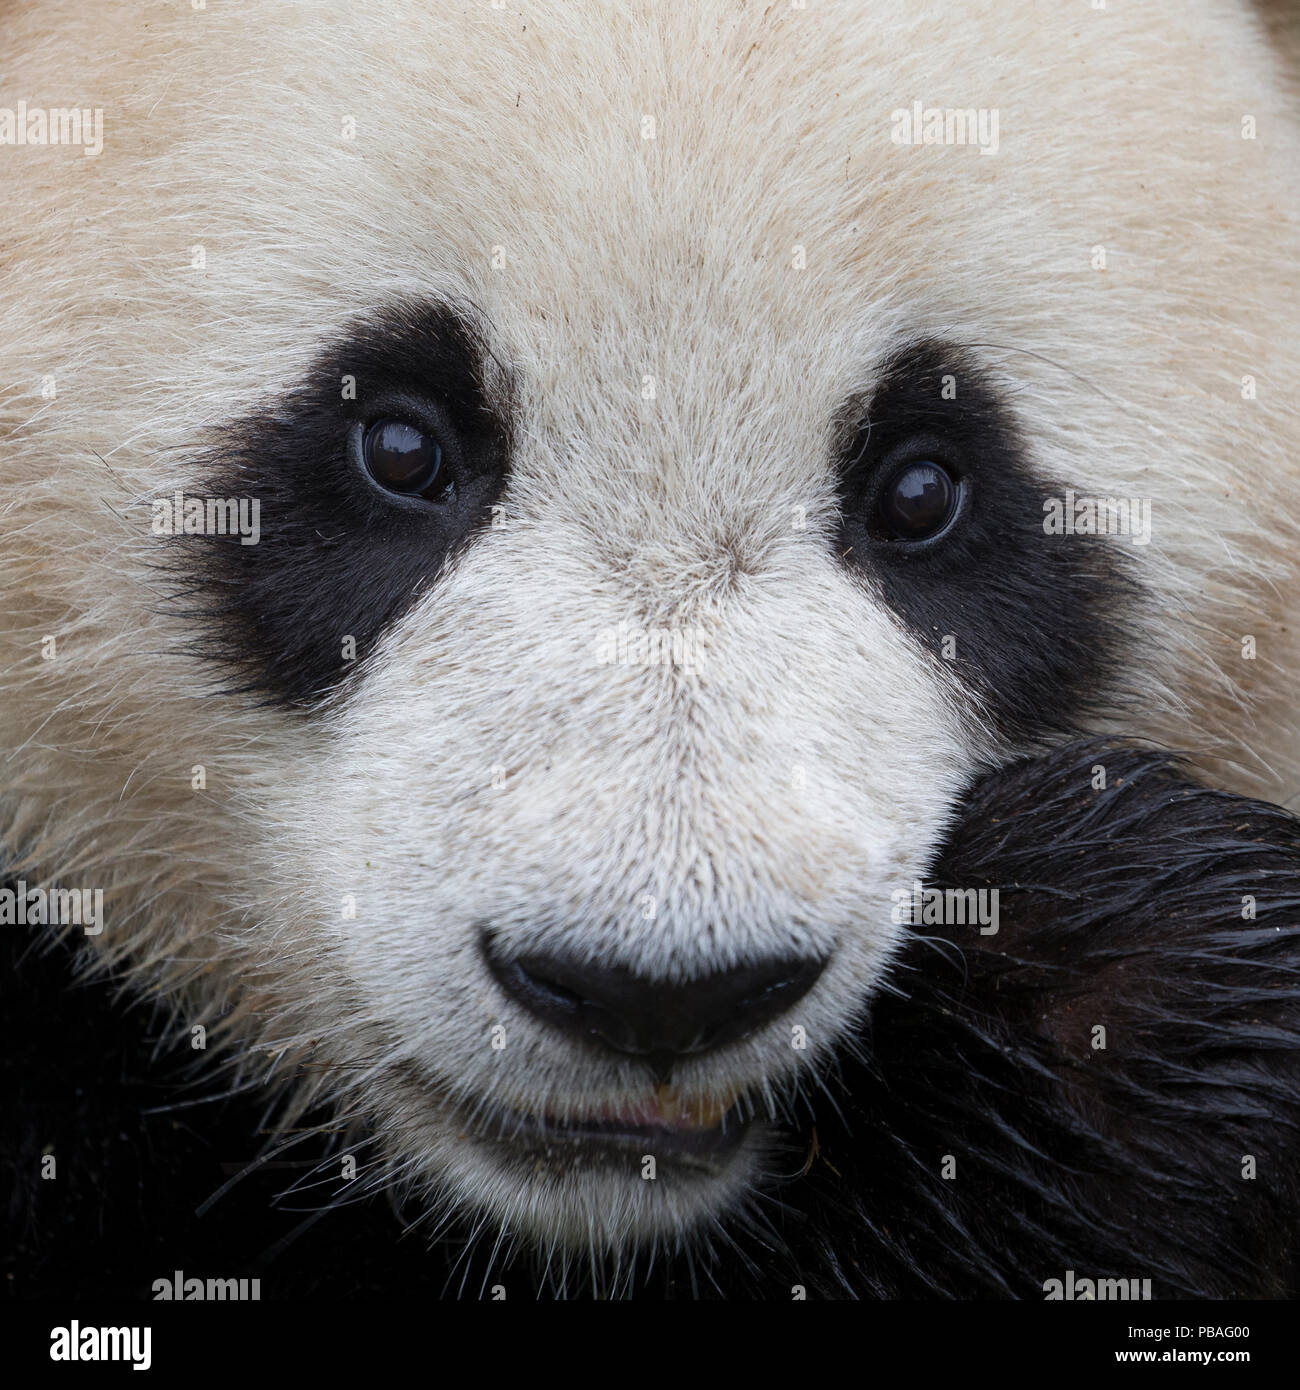 Panda géant (Ailuropoda melanoleuca) face close up imperdable, Chine Photo Stock